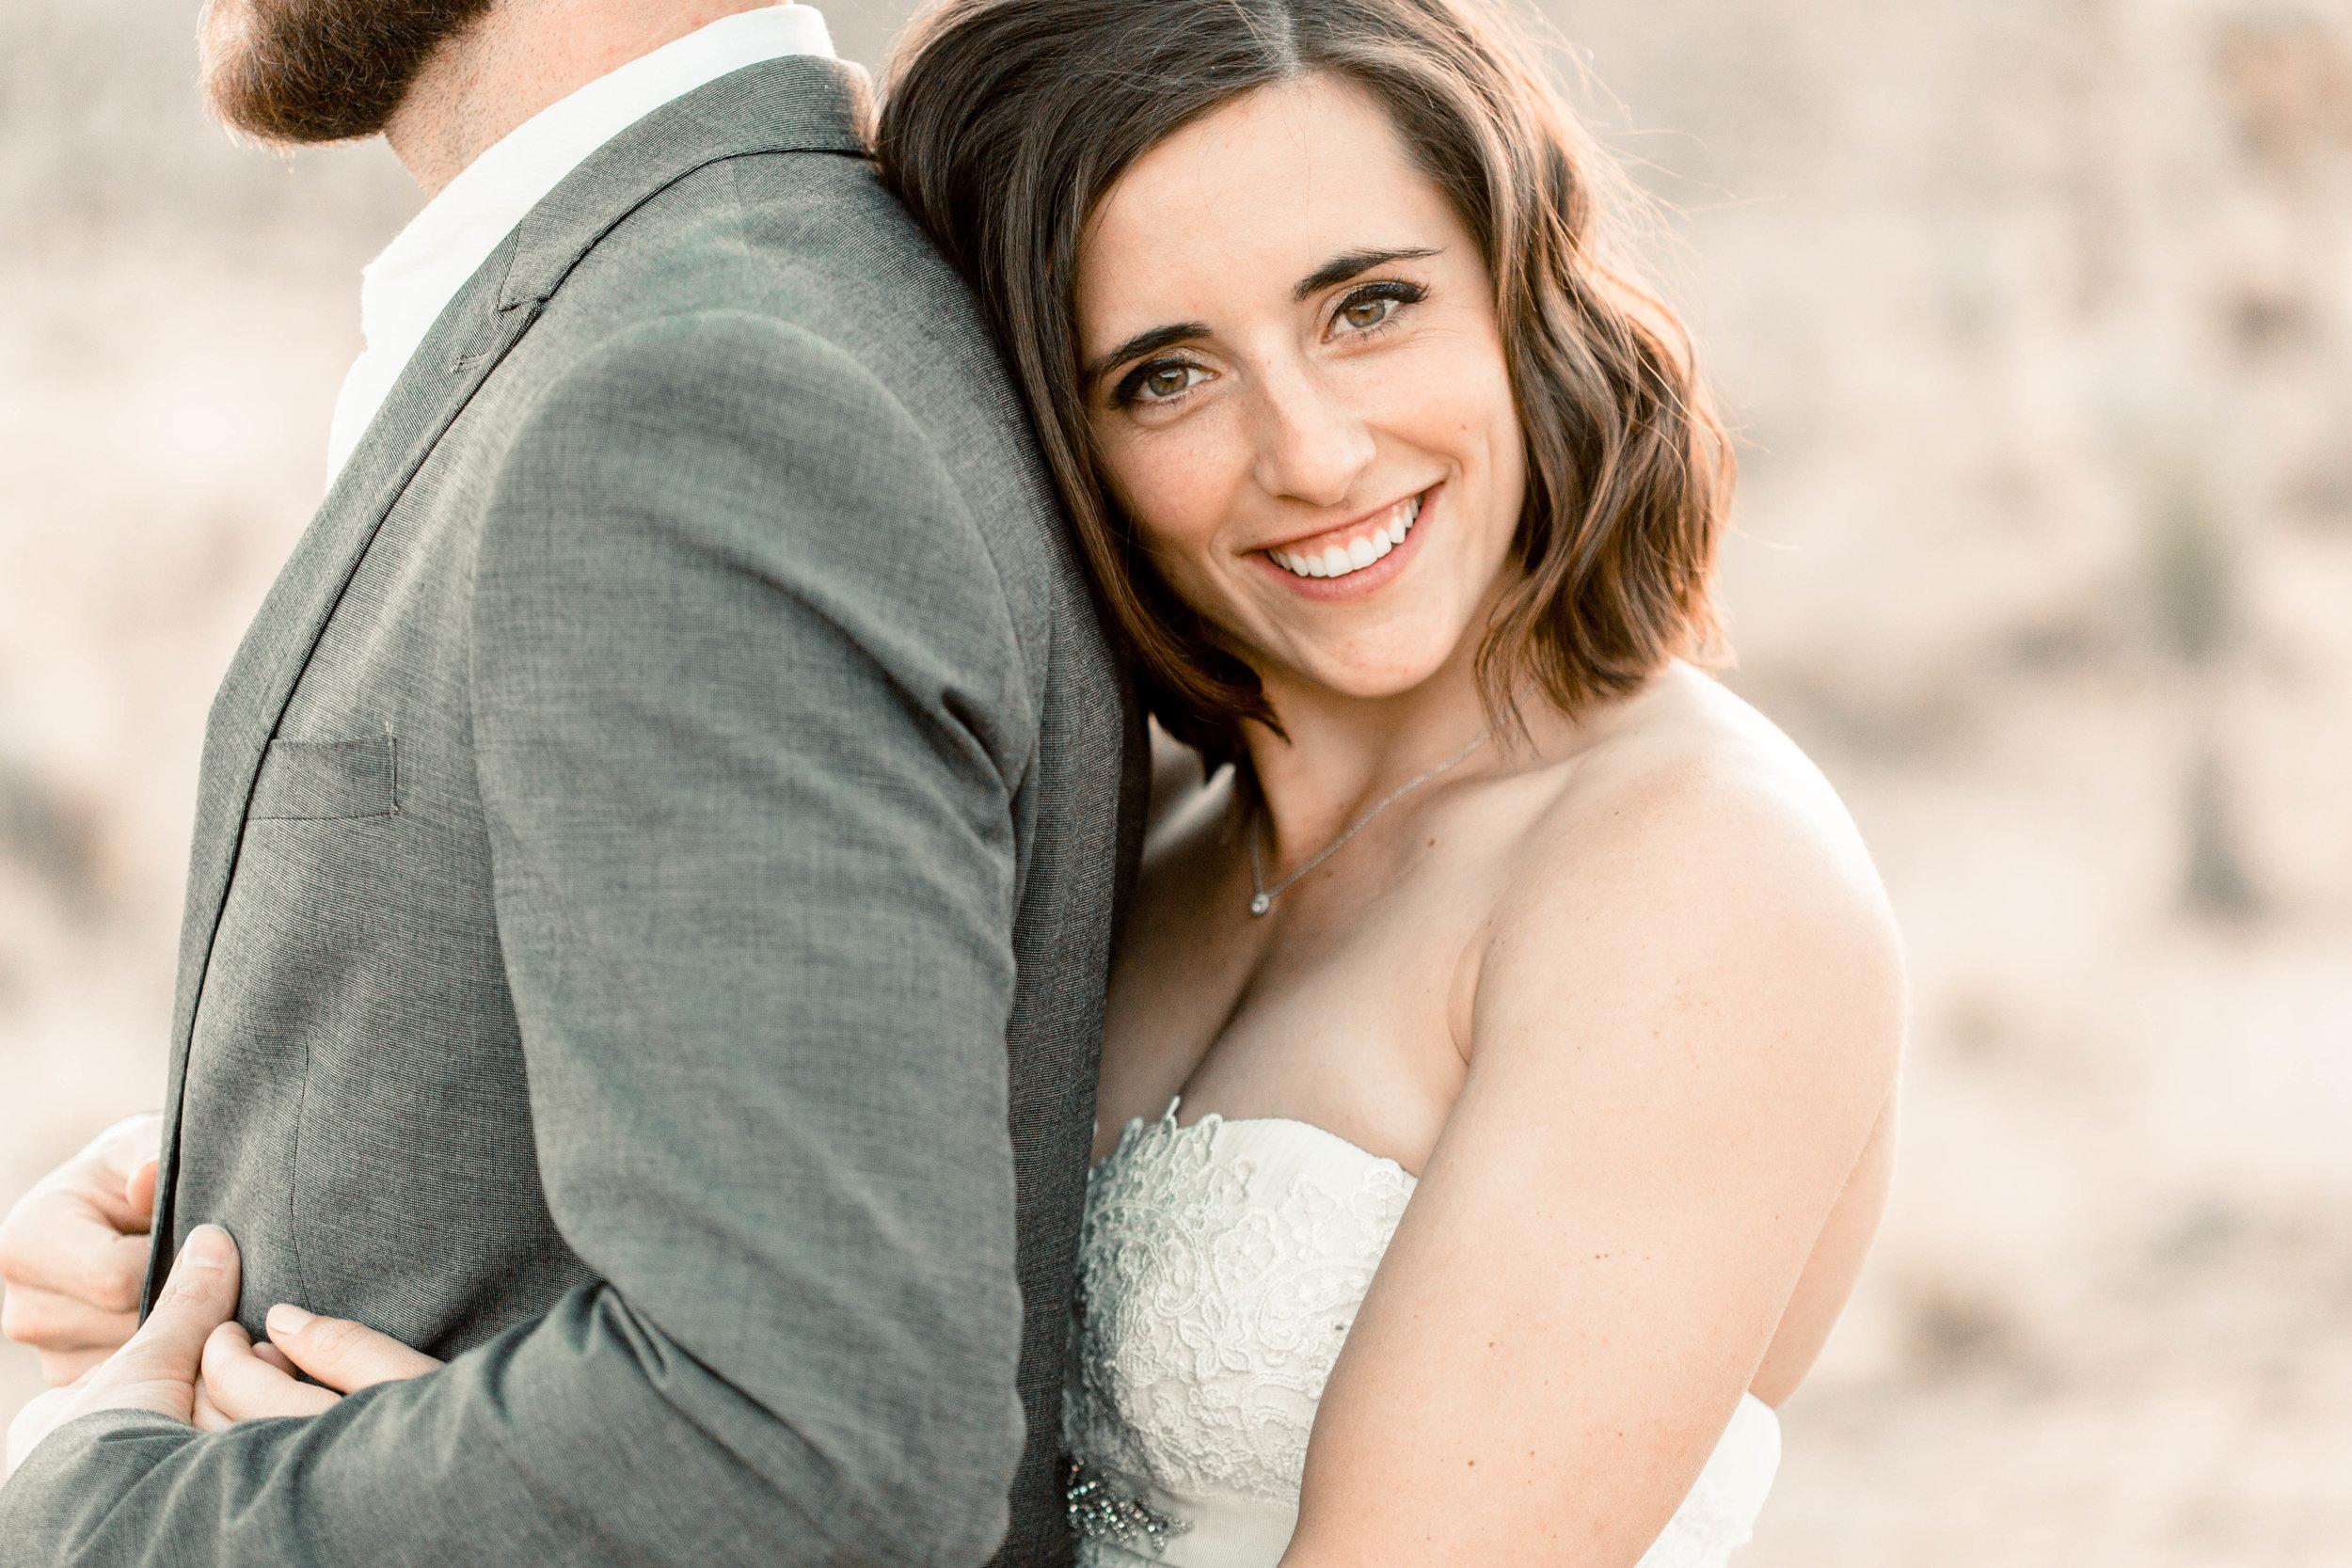 nicole-daacke-photography-joshua-tree-adventurous-elopement-wedding-national-park-wedding-photographer-adventure-wedding-adventurous-elopement-jtree-joshua-tree-national-park-wedding-photographer-intimate-weddings-golden-desert-love-34.jpg